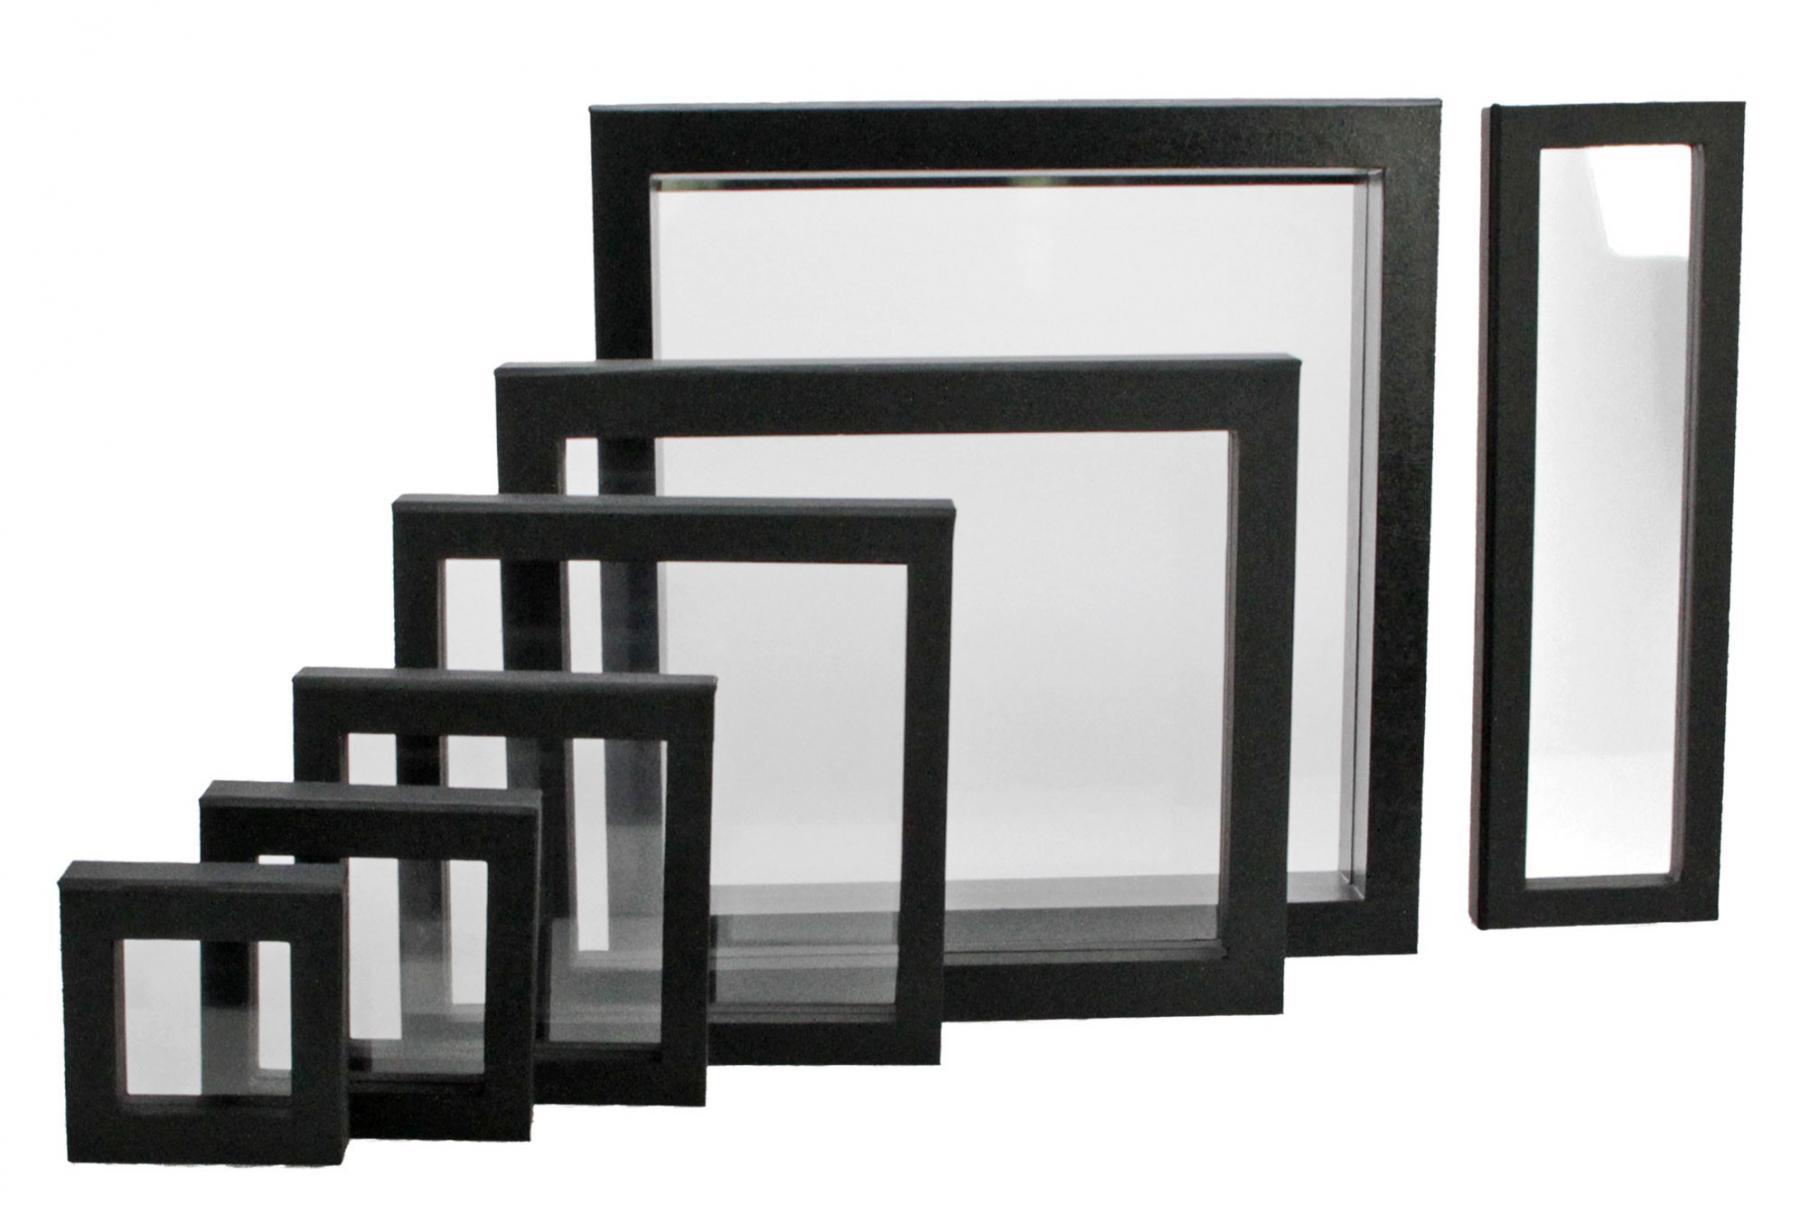 safe 4516 schwebe rahmen fotorahmen bilderrahmen 3d weiss. Black Bedroom Furniture Sets. Home Design Ideas